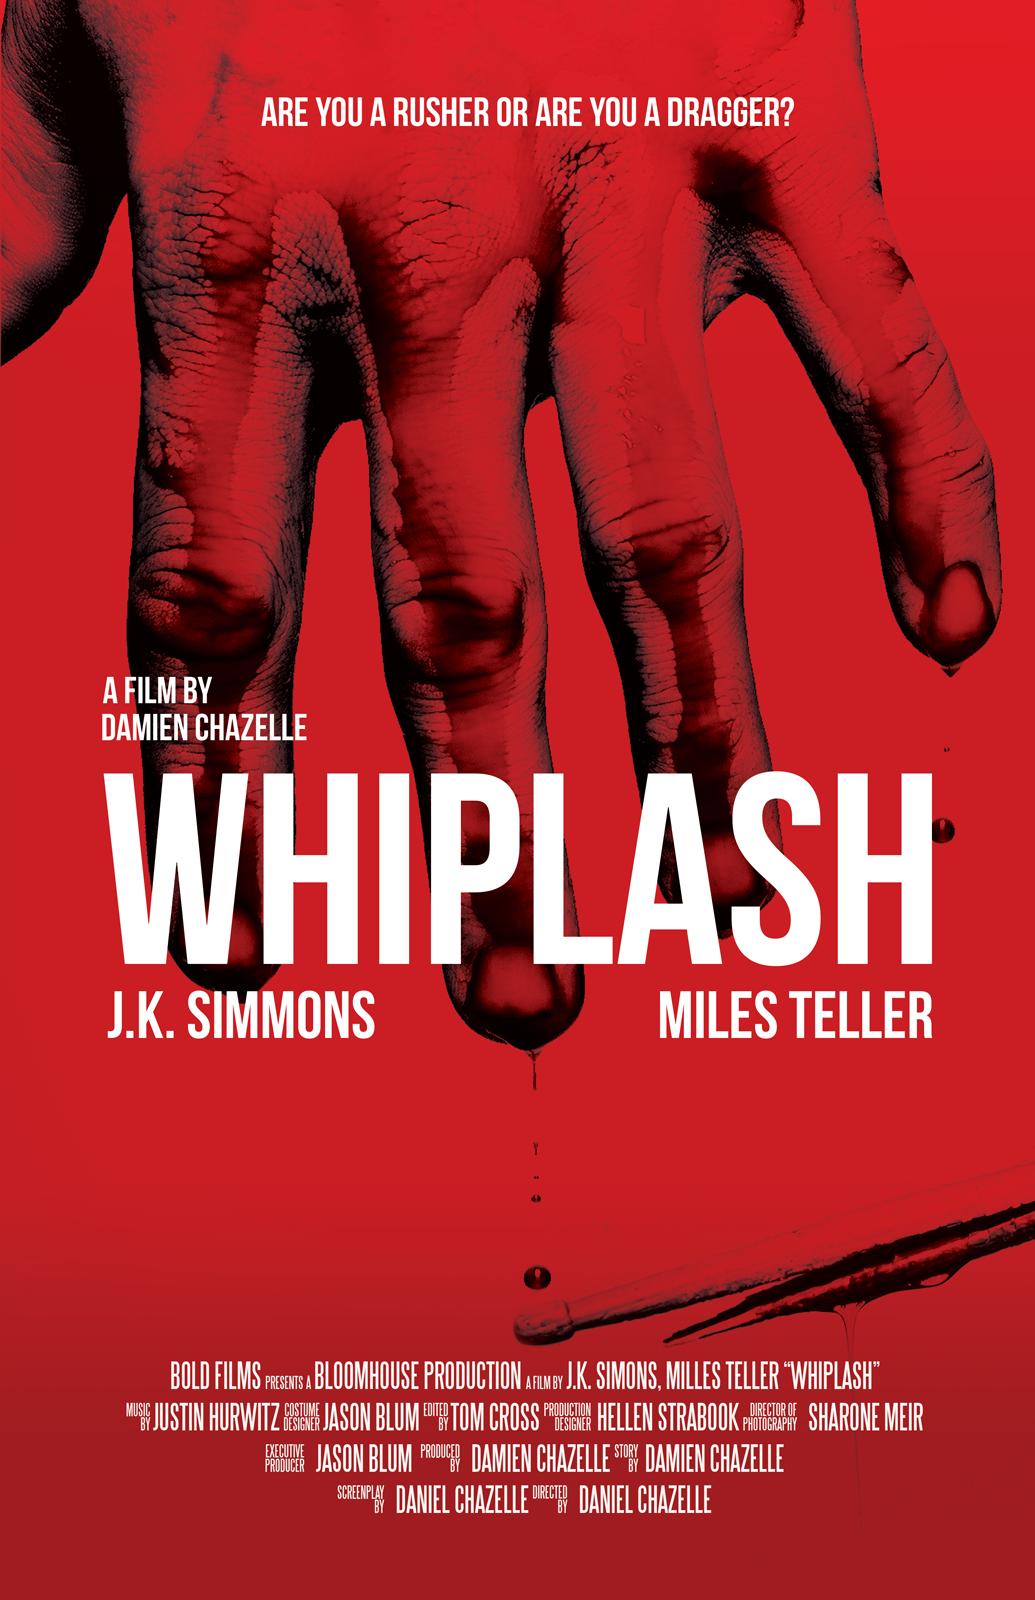 From The Depths Of DVD Hell: Whiplash  |Whiplash Movie Poster